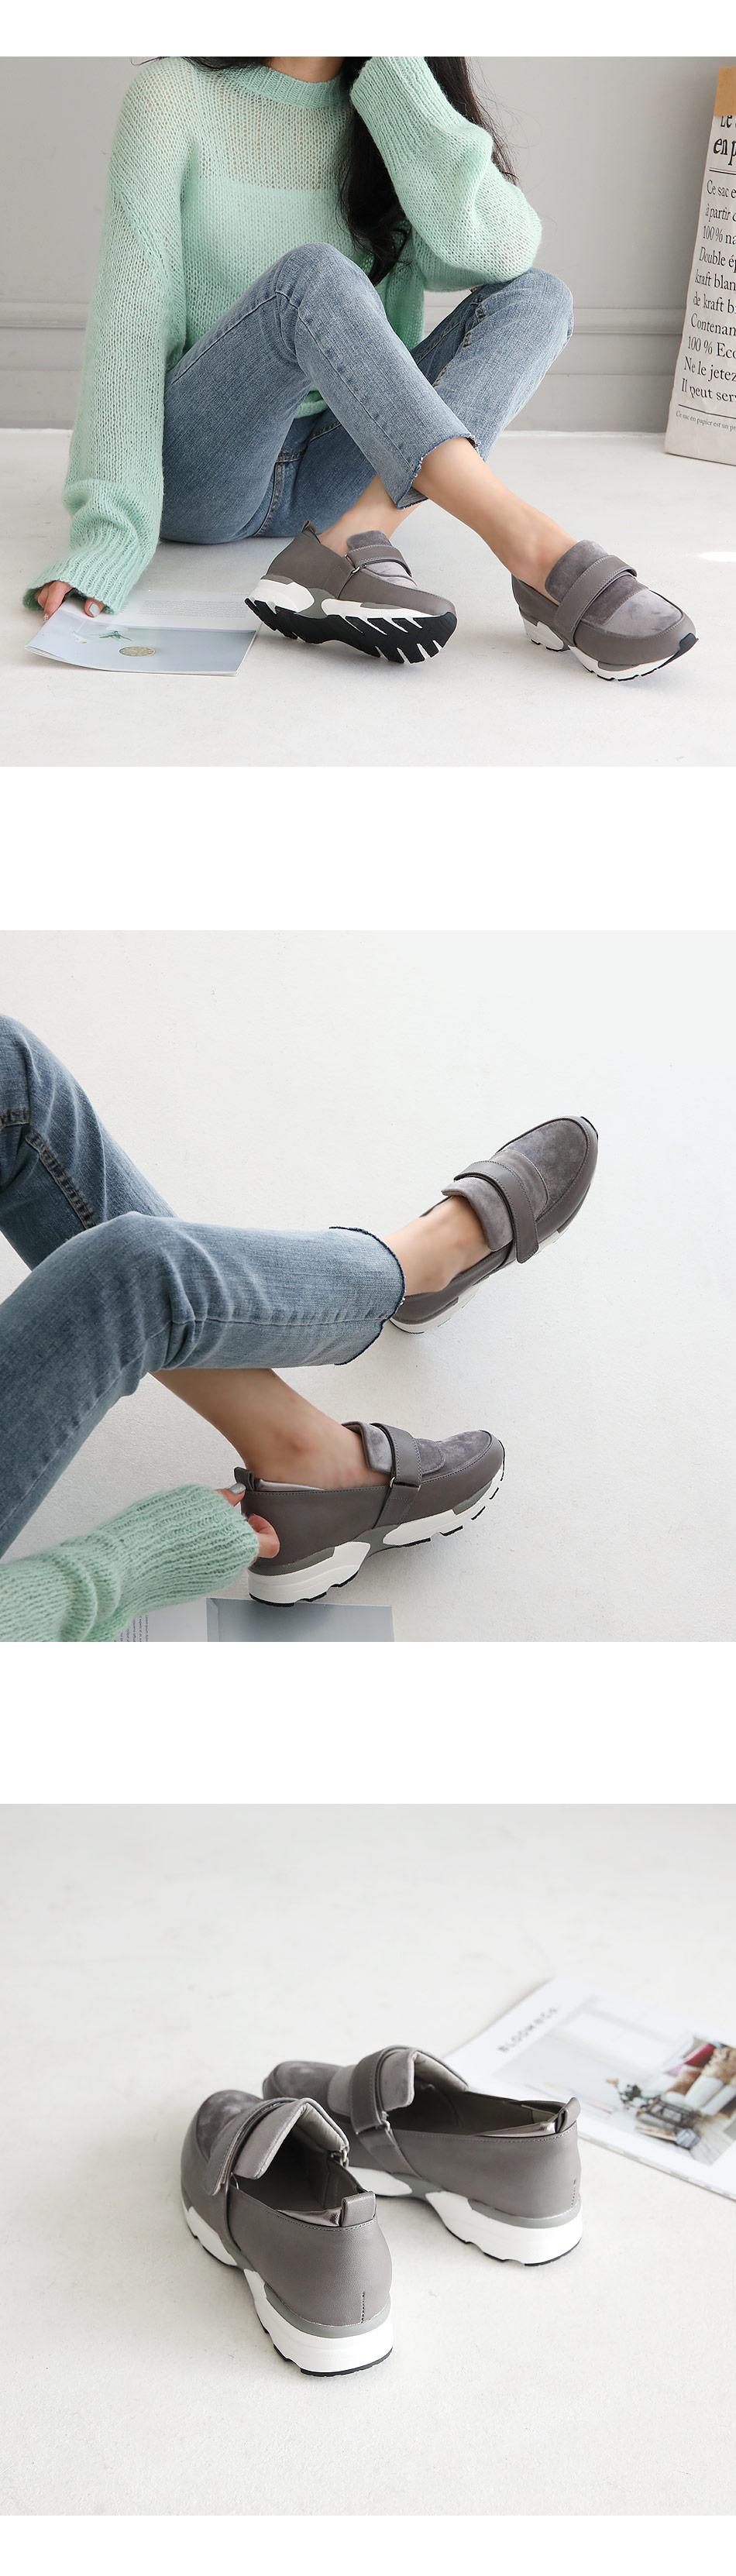 Nyclan Velcro Sneakers 3cm